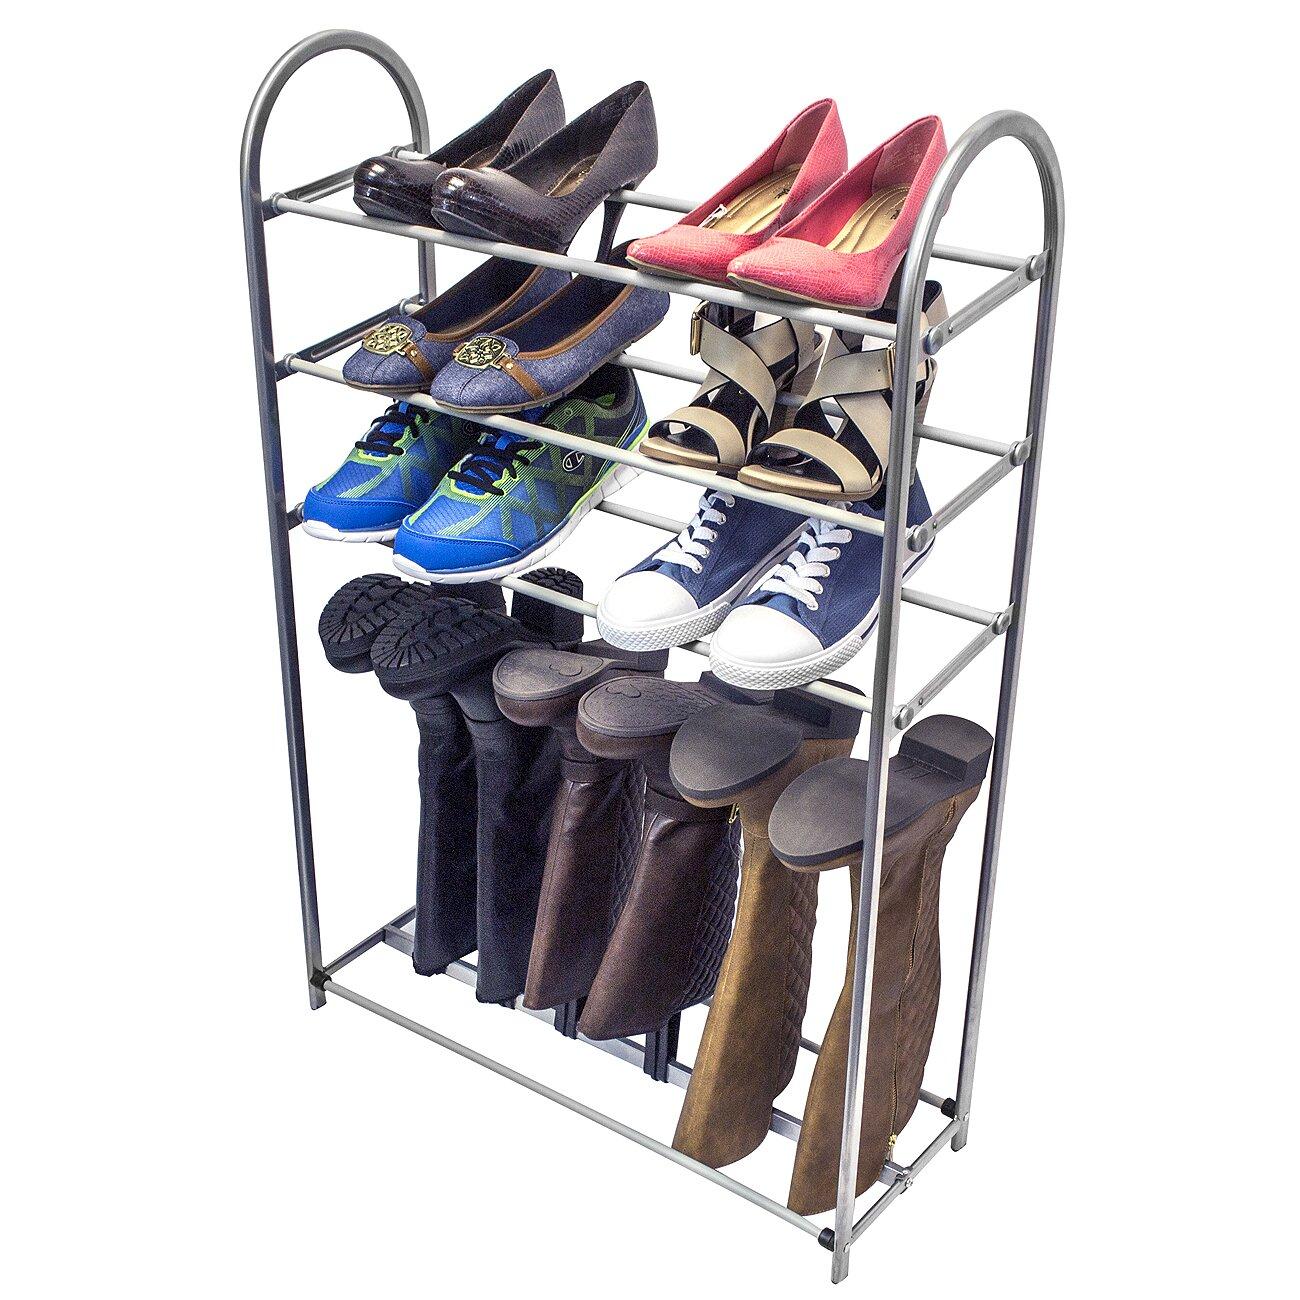 ggi international sorbus 4 tier shoe rack reviews. Black Bedroom Furniture Sets. Home Design Ideas